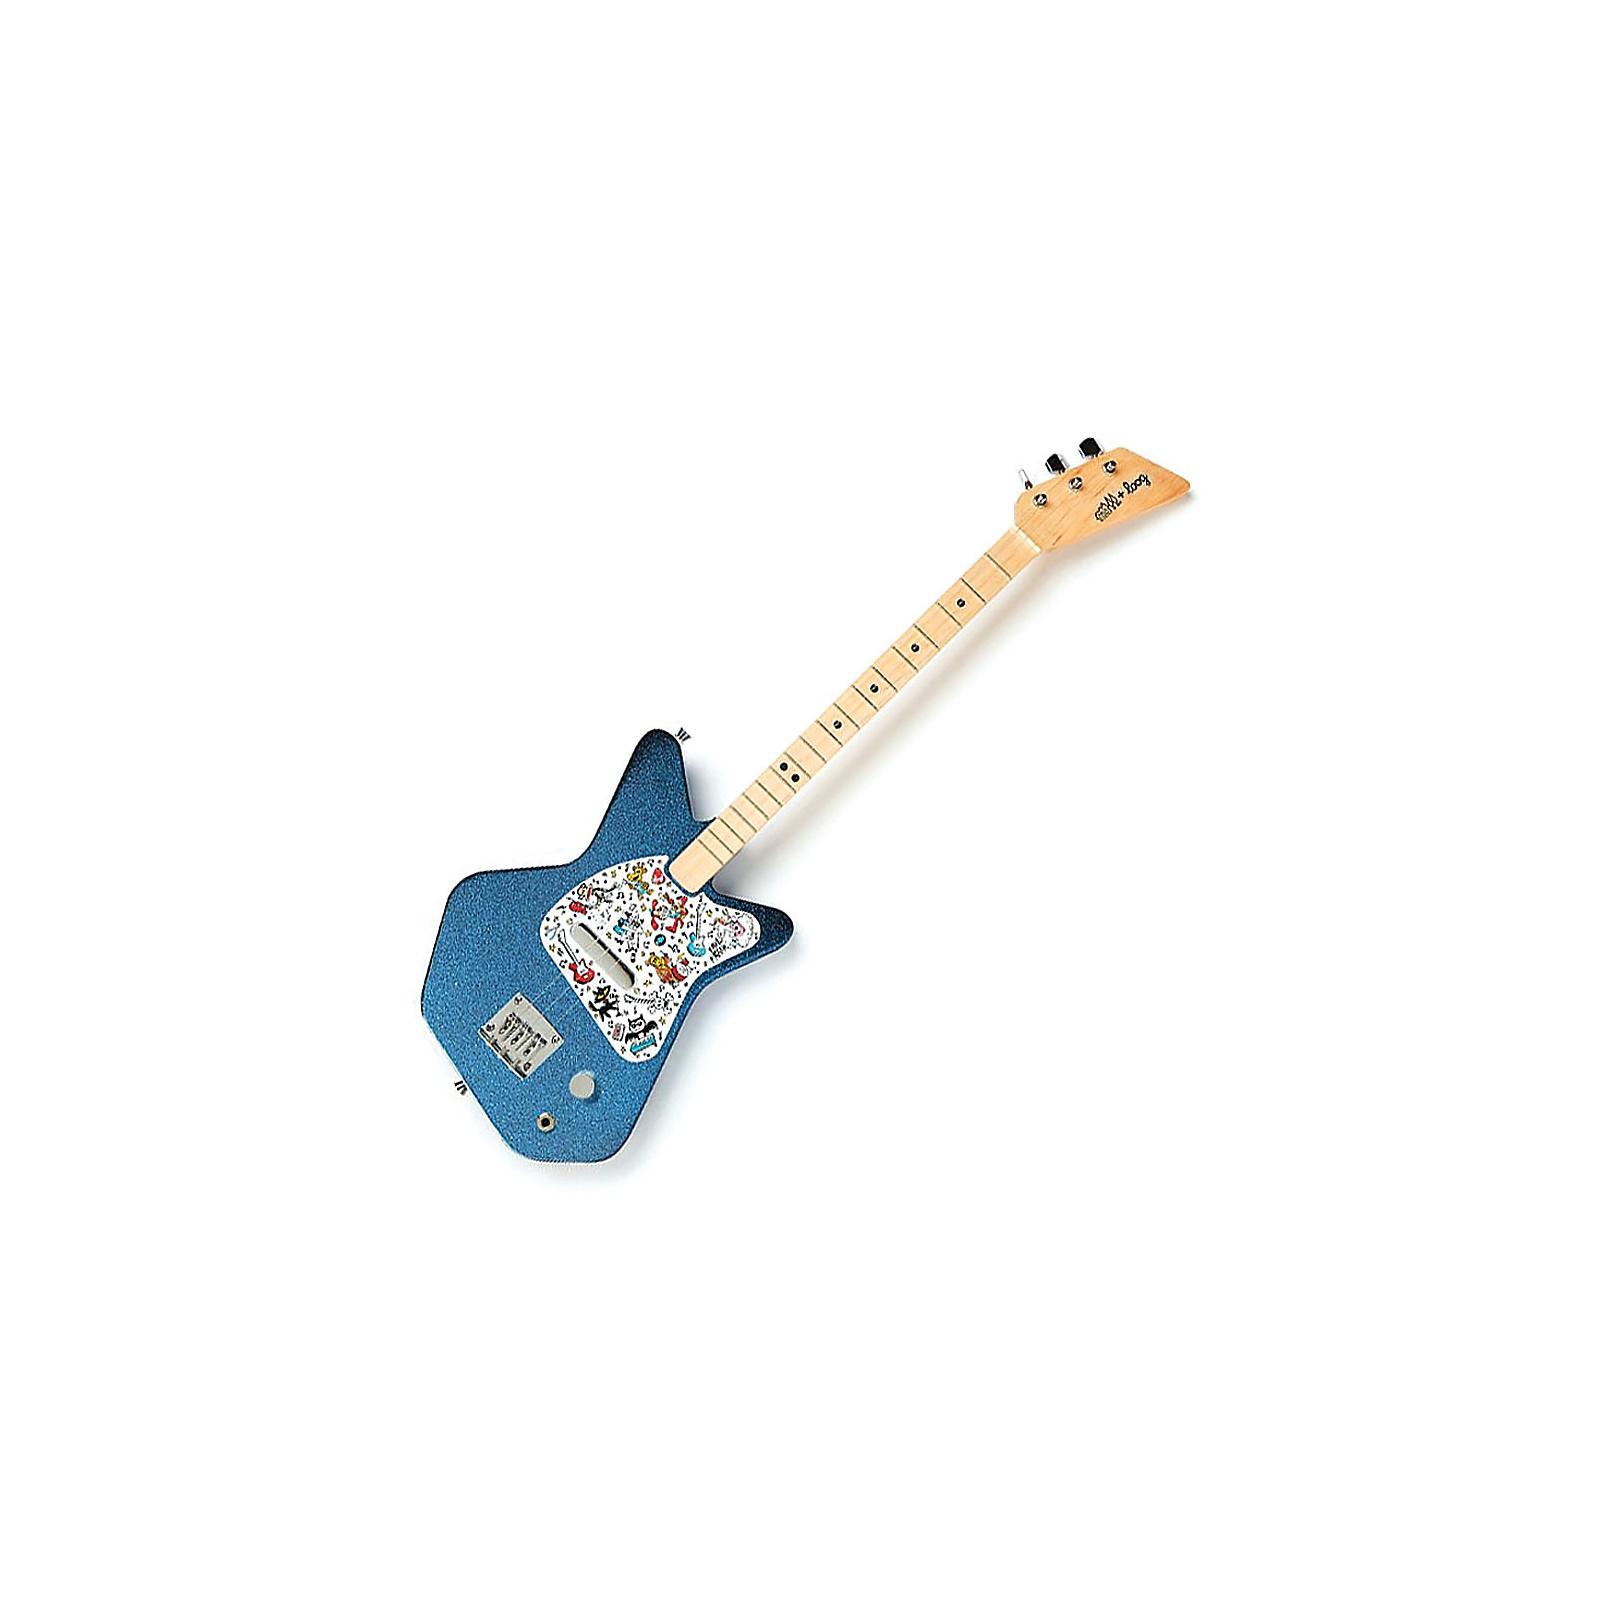 Loog Guitars Pro Electric Guitar for Kids Paul Frank Edition